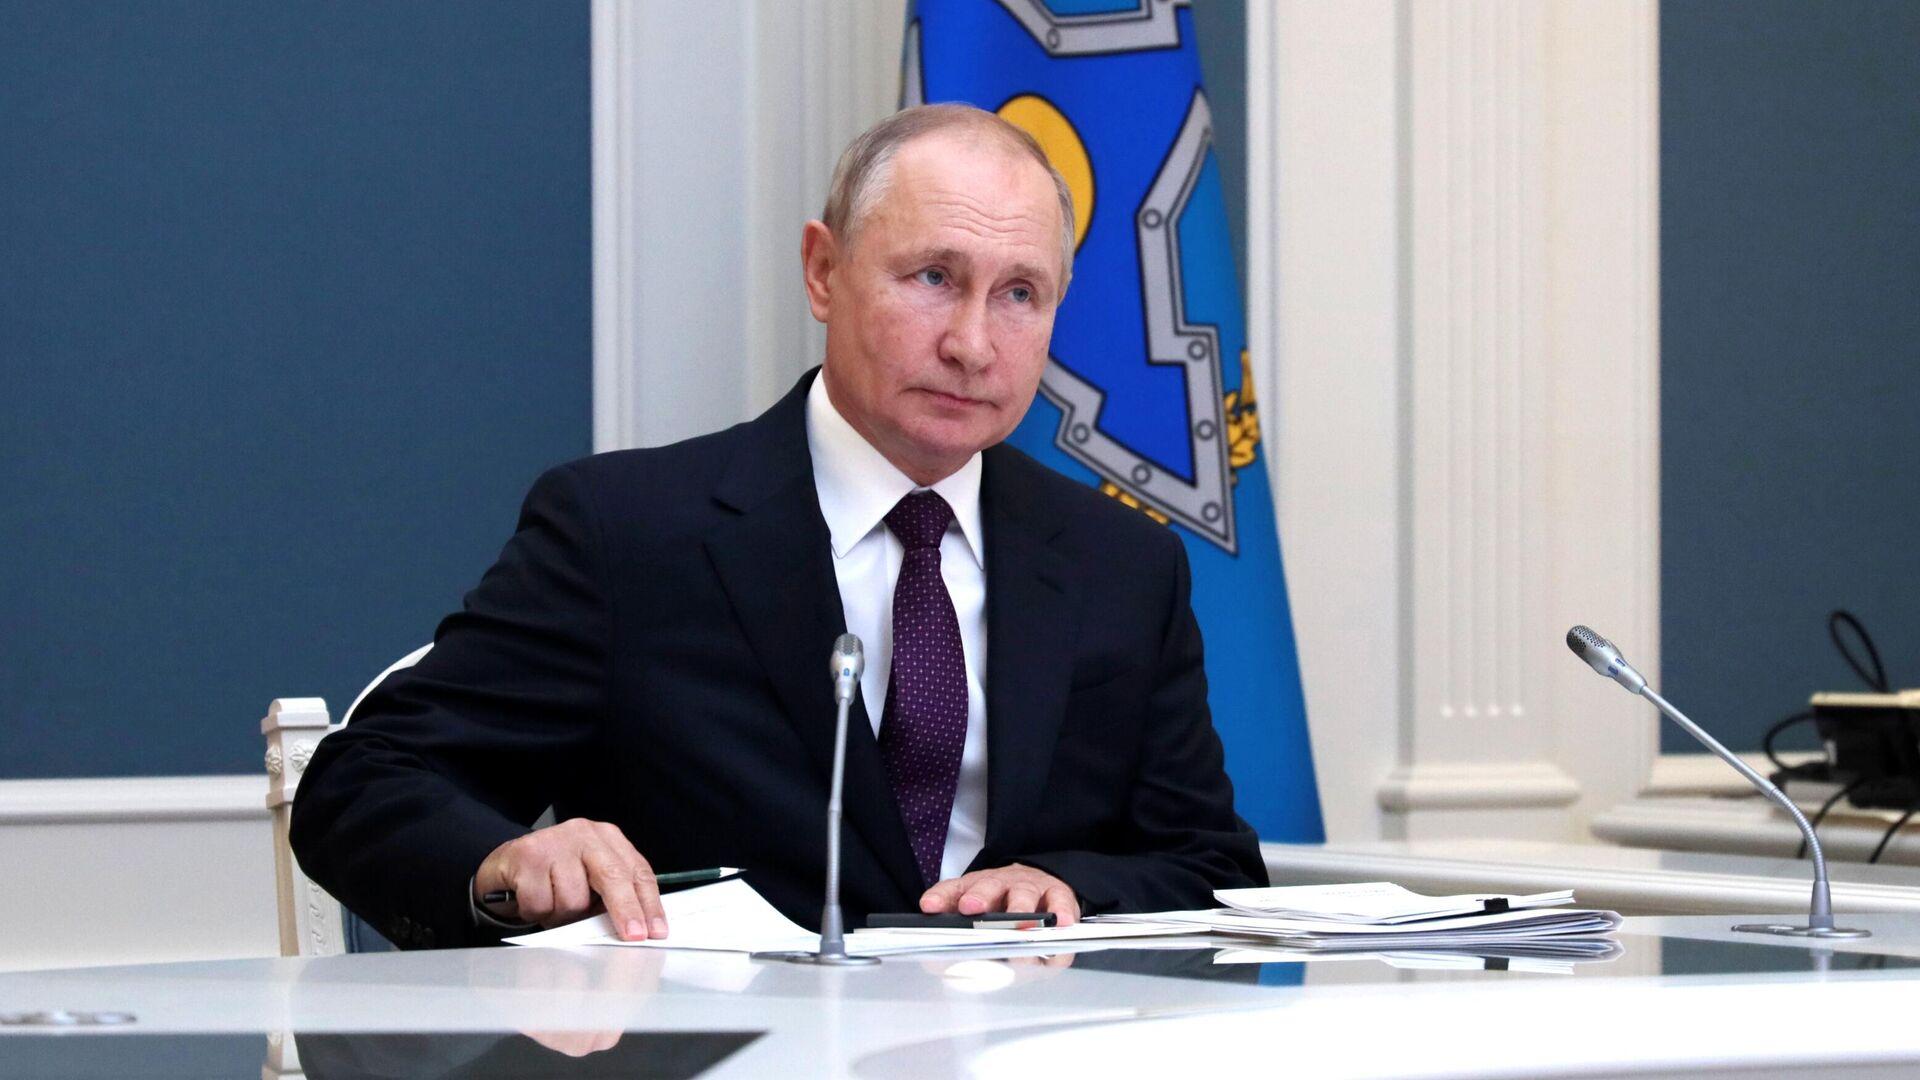 Президент РФ В. Путин - Sputnik Тоҷикистон, 1920, 16.09.2021